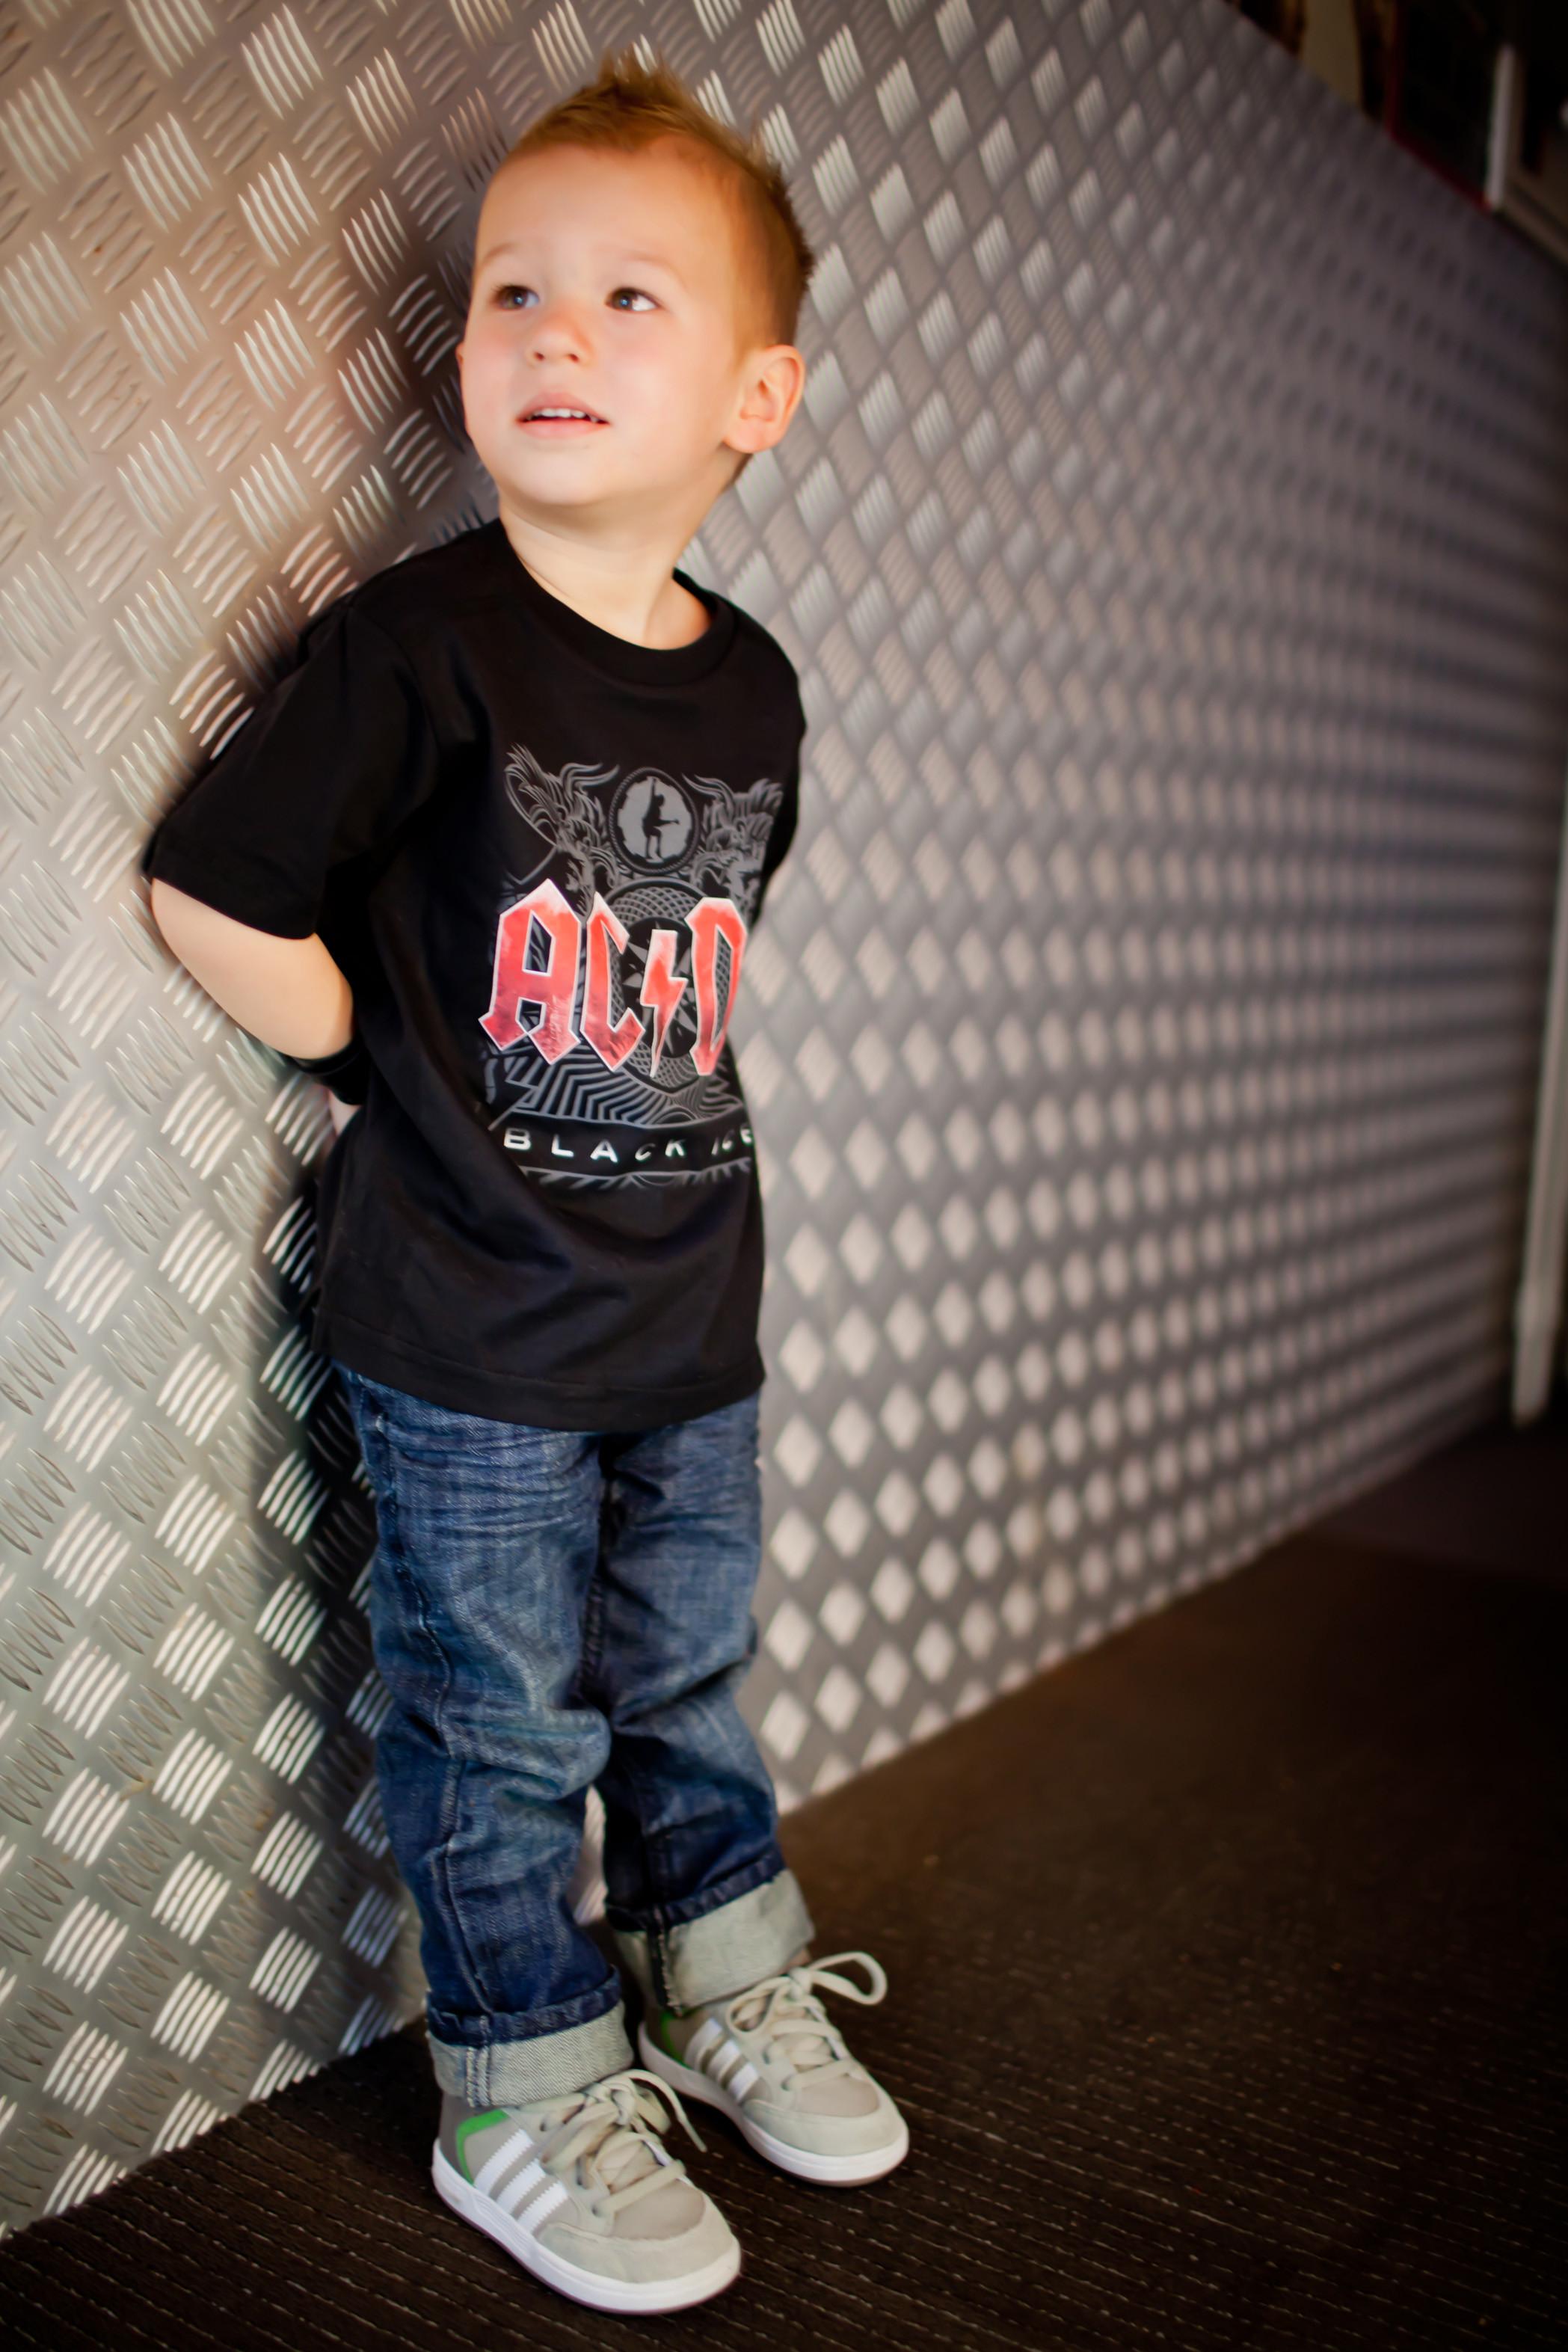 ACDC Metal Kinder T-Shirt Black Ice AC/DC